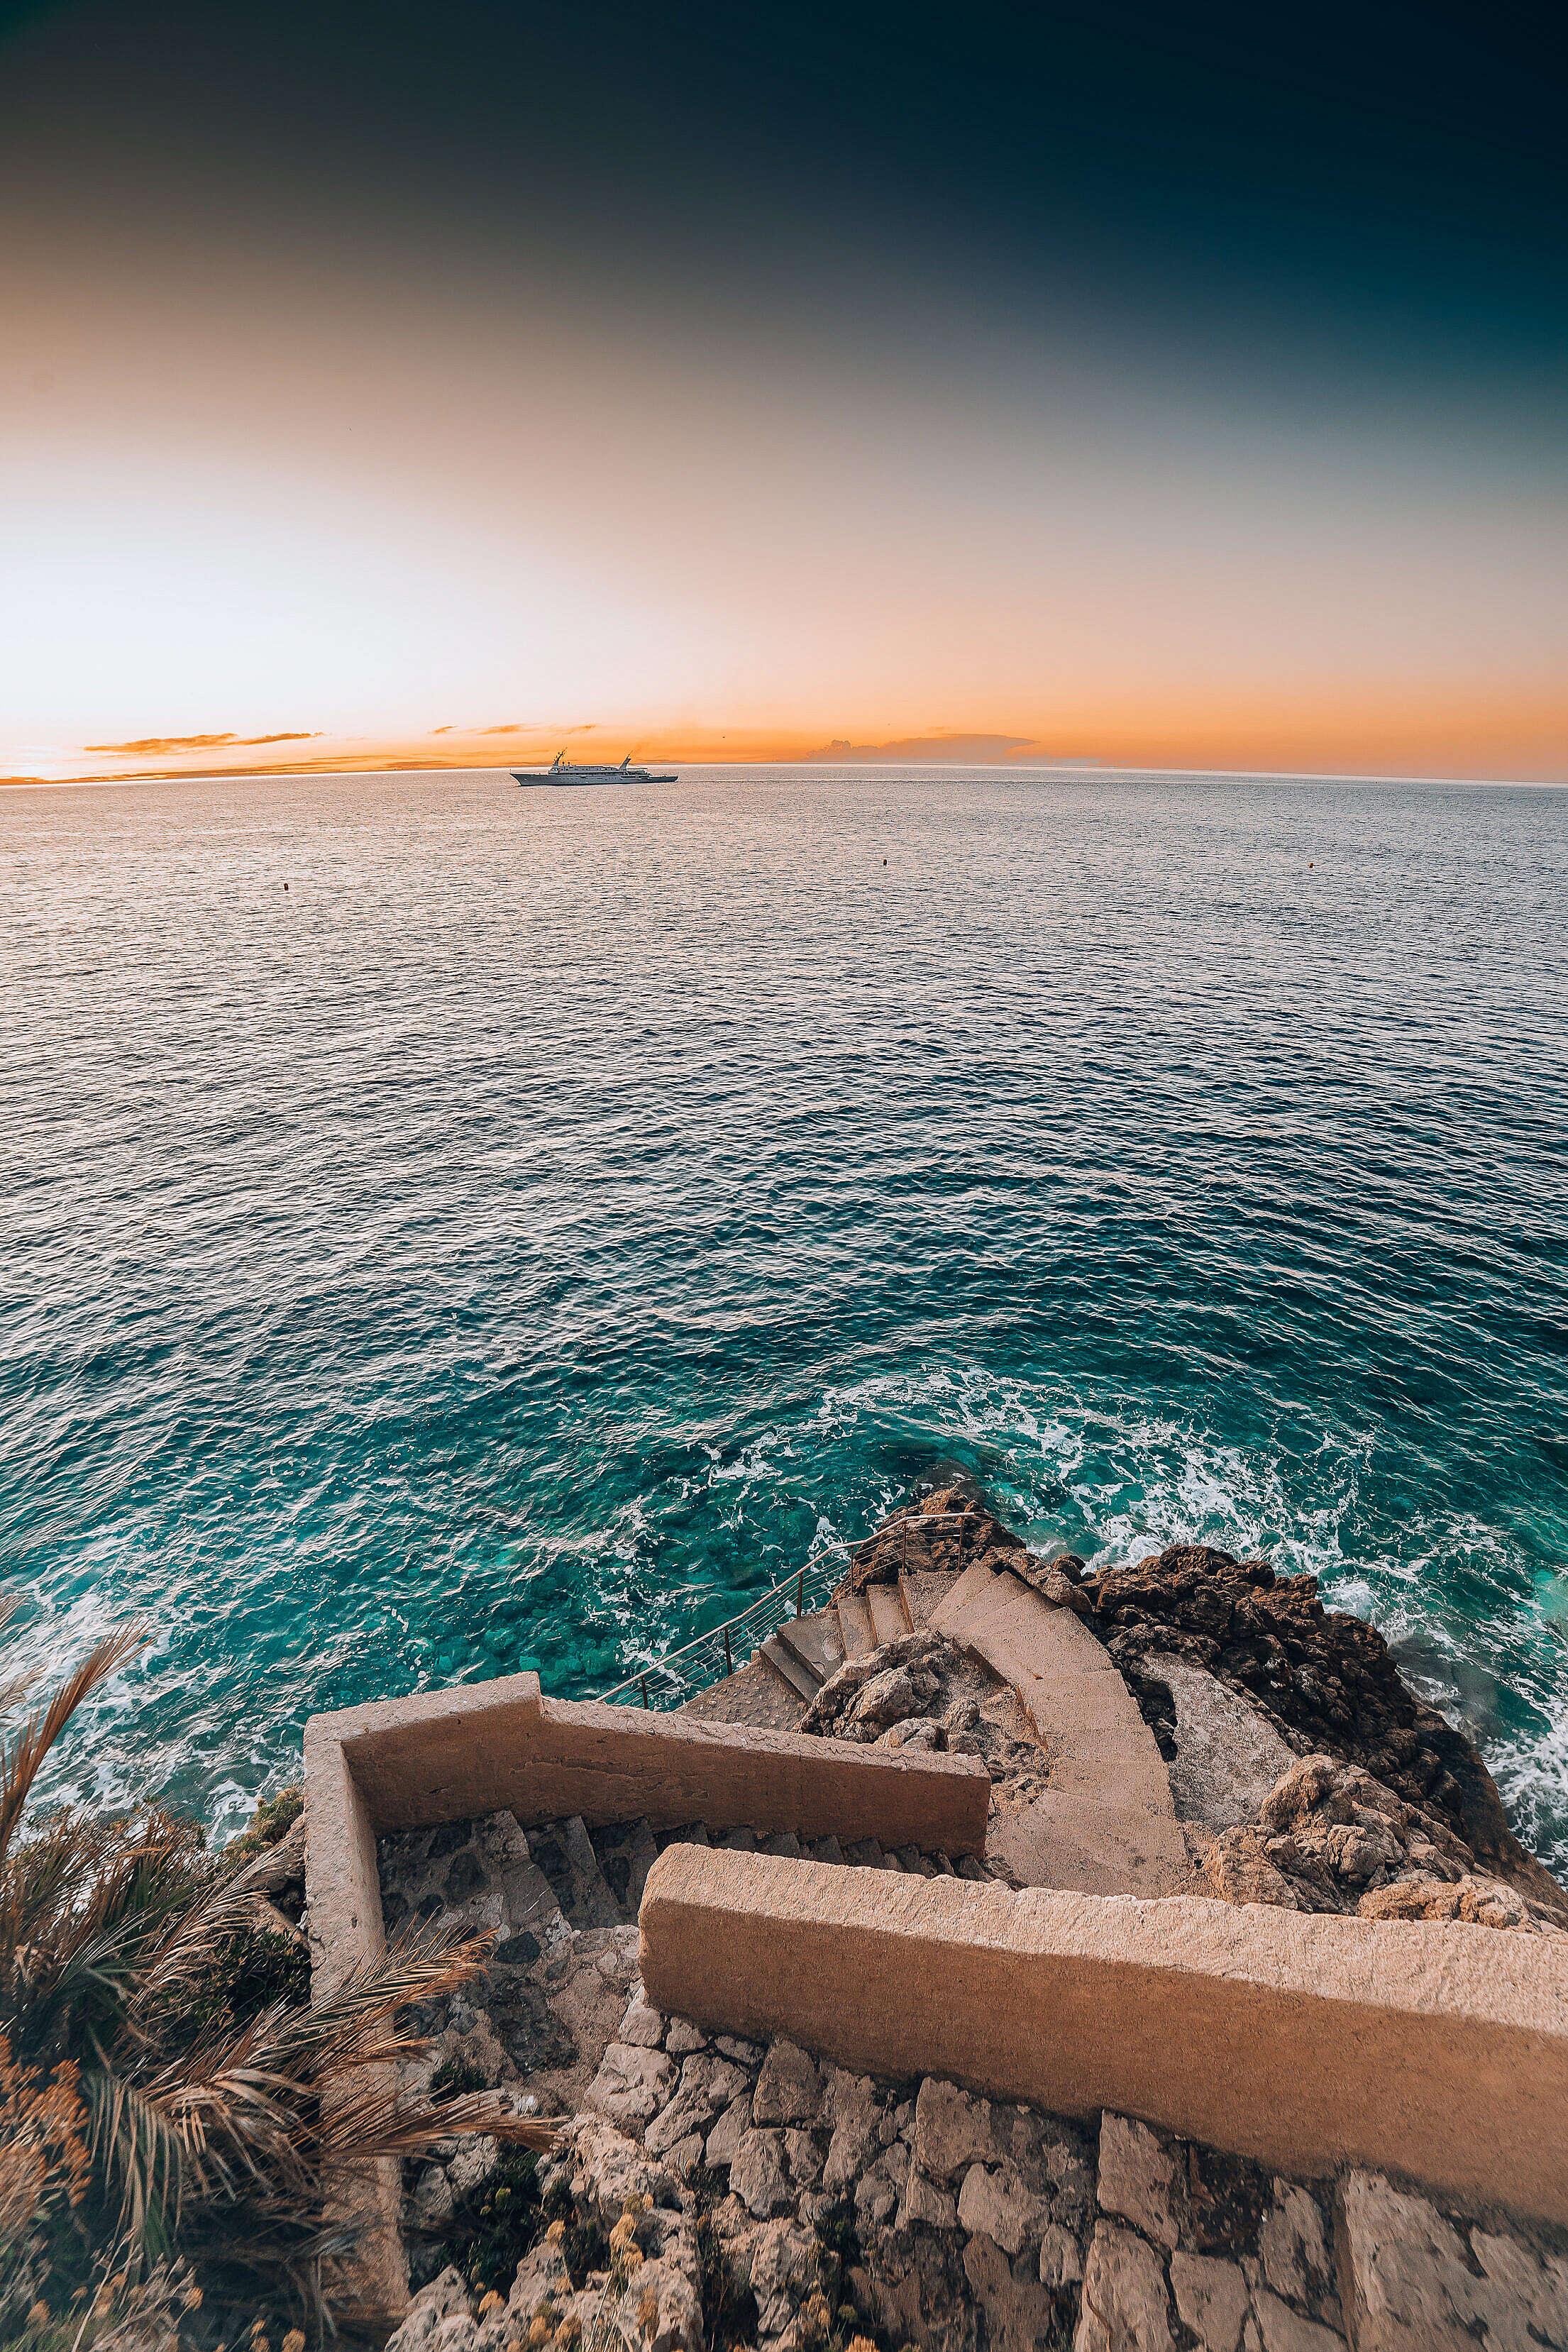 Early Morning in The Coast of Monaco Free Stock Photo